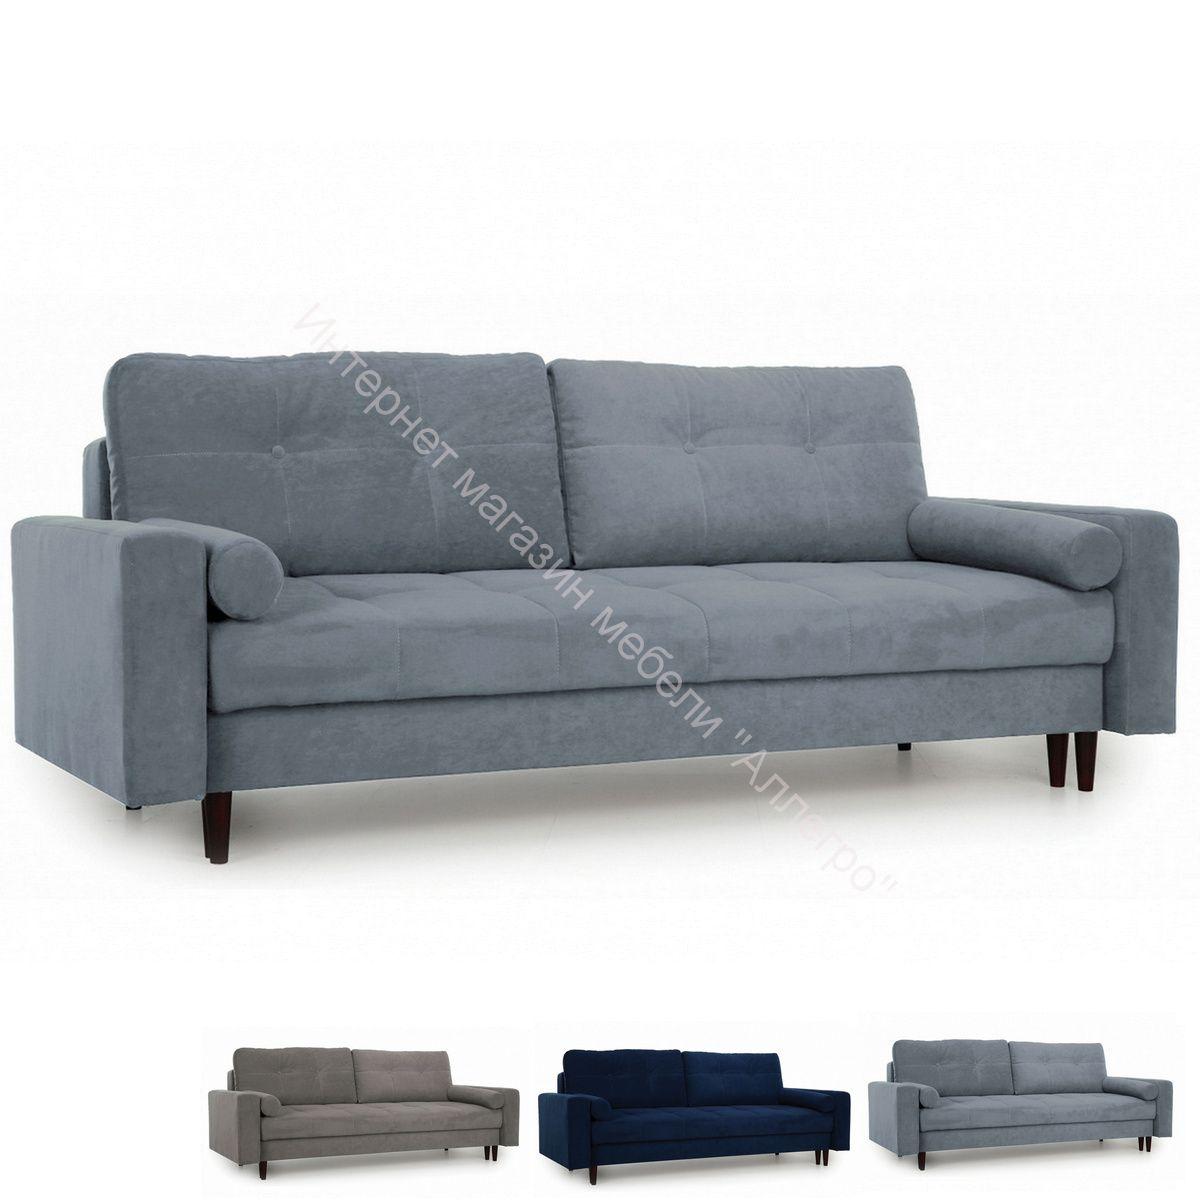 Диван-кровать Лоретт (Galaxy 14, 16, 21 (велюр) синий, бежевый, серый)